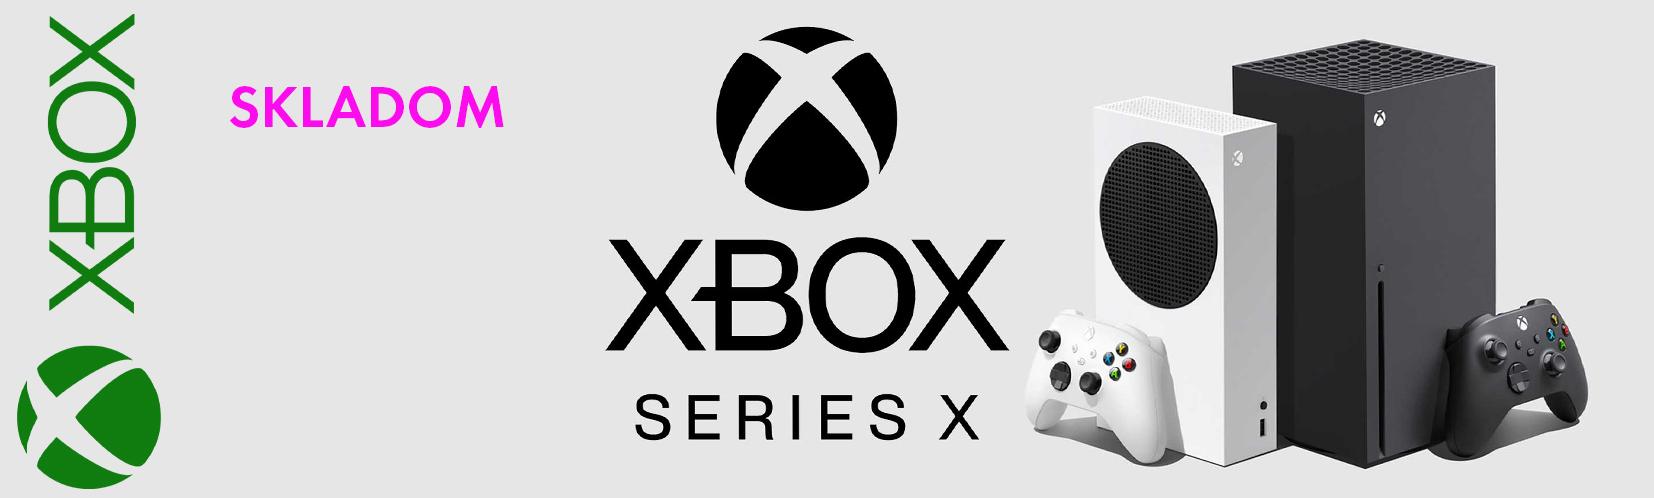 xbox series banner